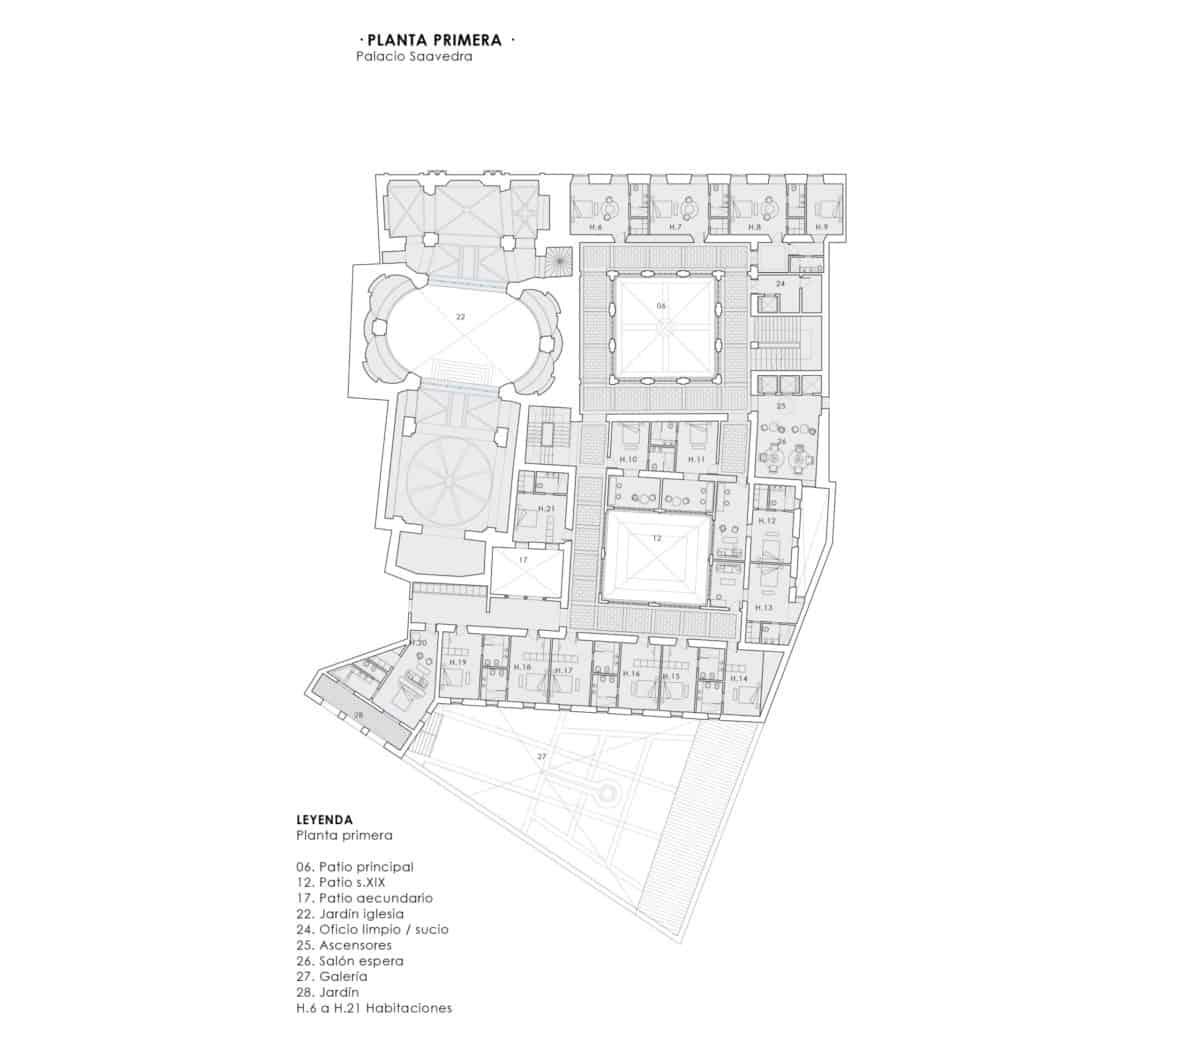 JIMENEZ&LINARES_DRIEHAUS GUADIX_Planta primera del Palacio de Saavedra